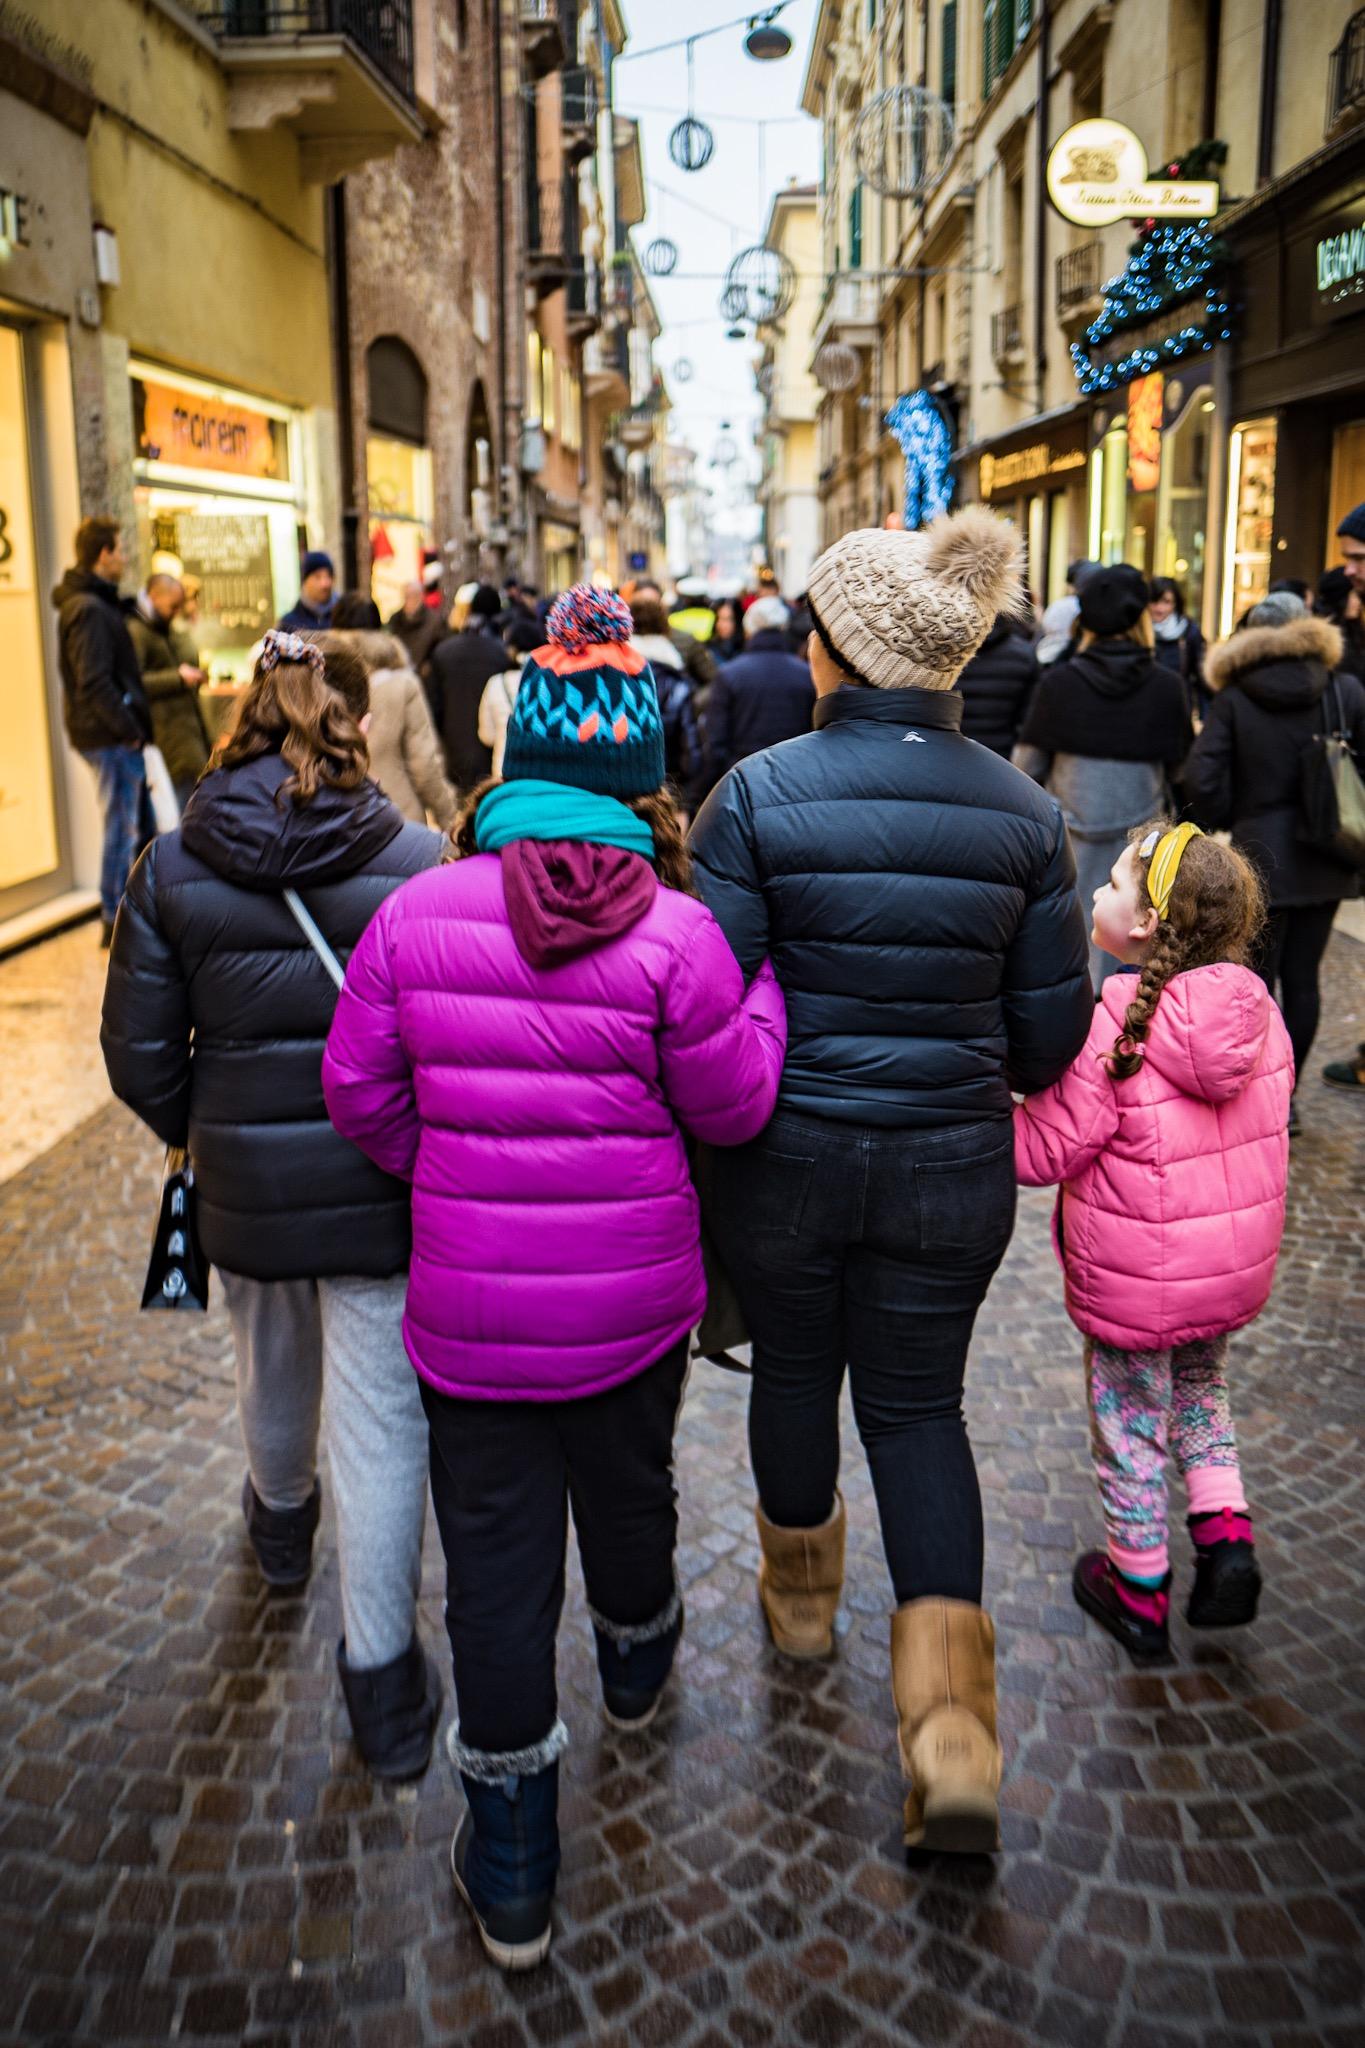 Exploring Verona streets and alleys